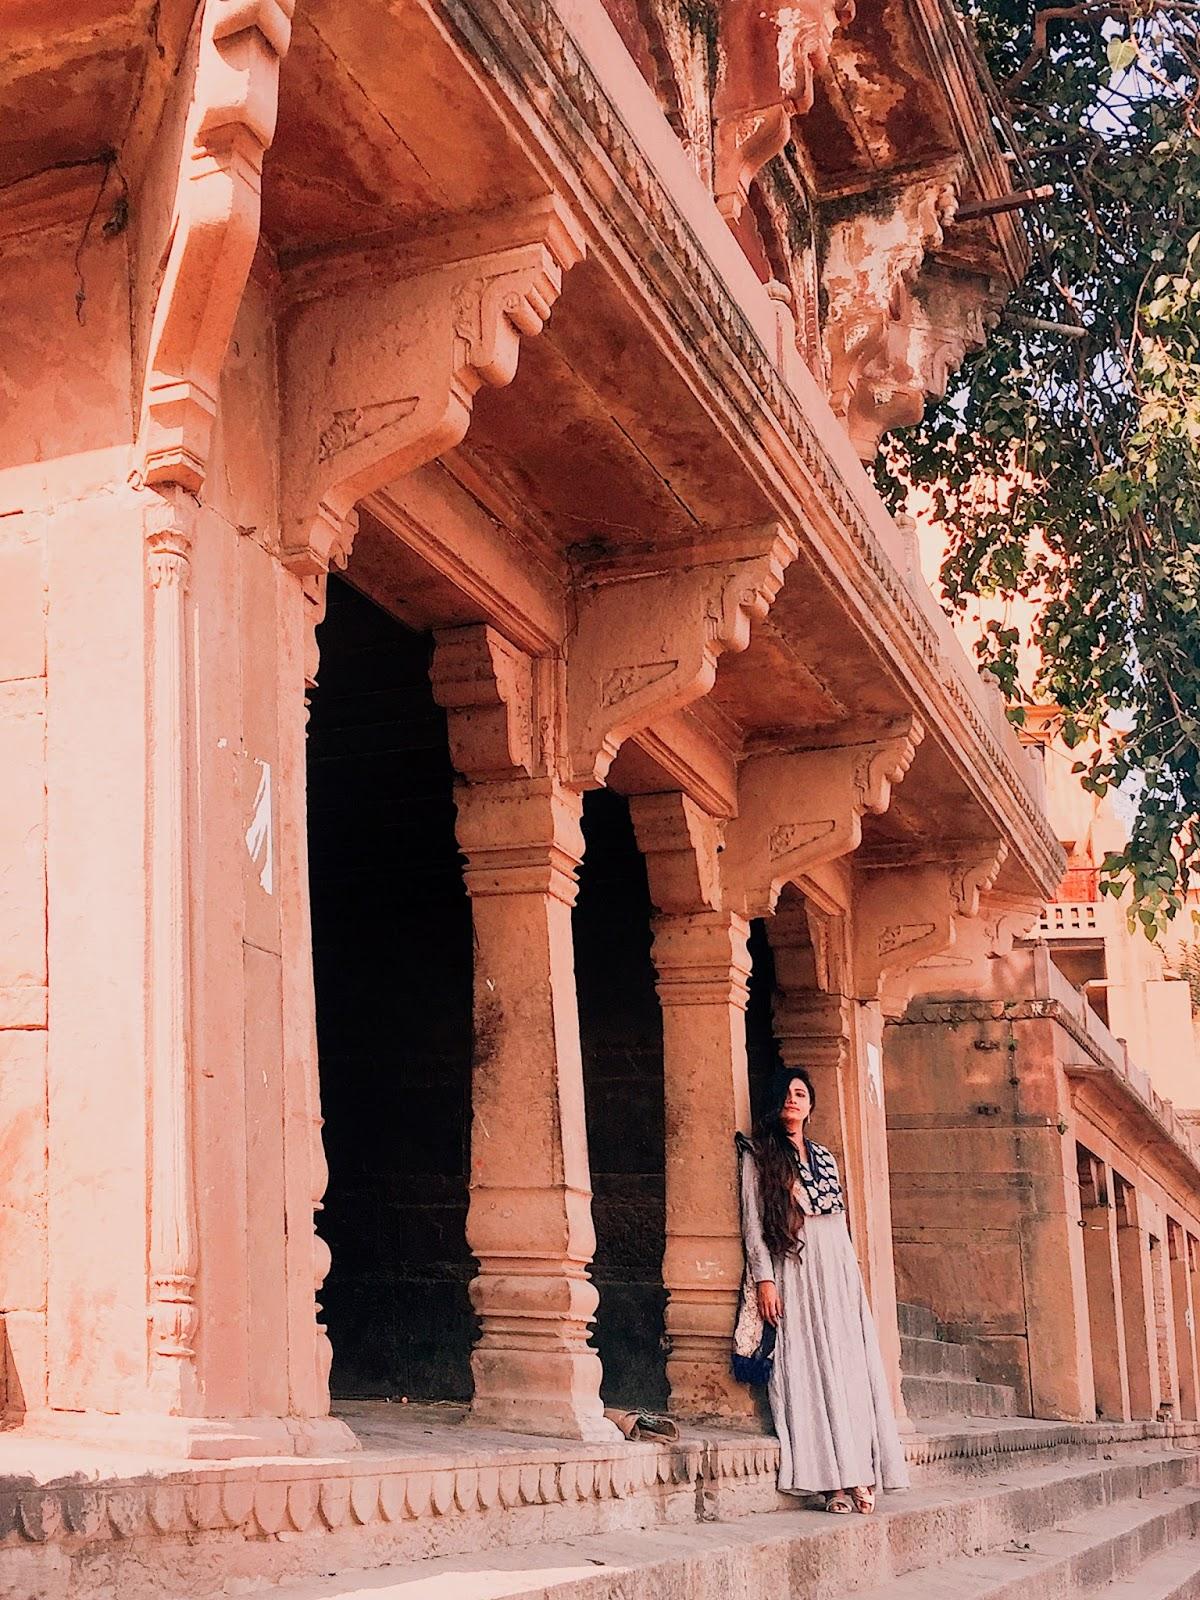 tulsi ghat, varanasi travel guide, vranasai information, tips on varanasi, travel varanasi, spiritual capital of india, city of temples, indian travel blogger, uk blog, benares travel